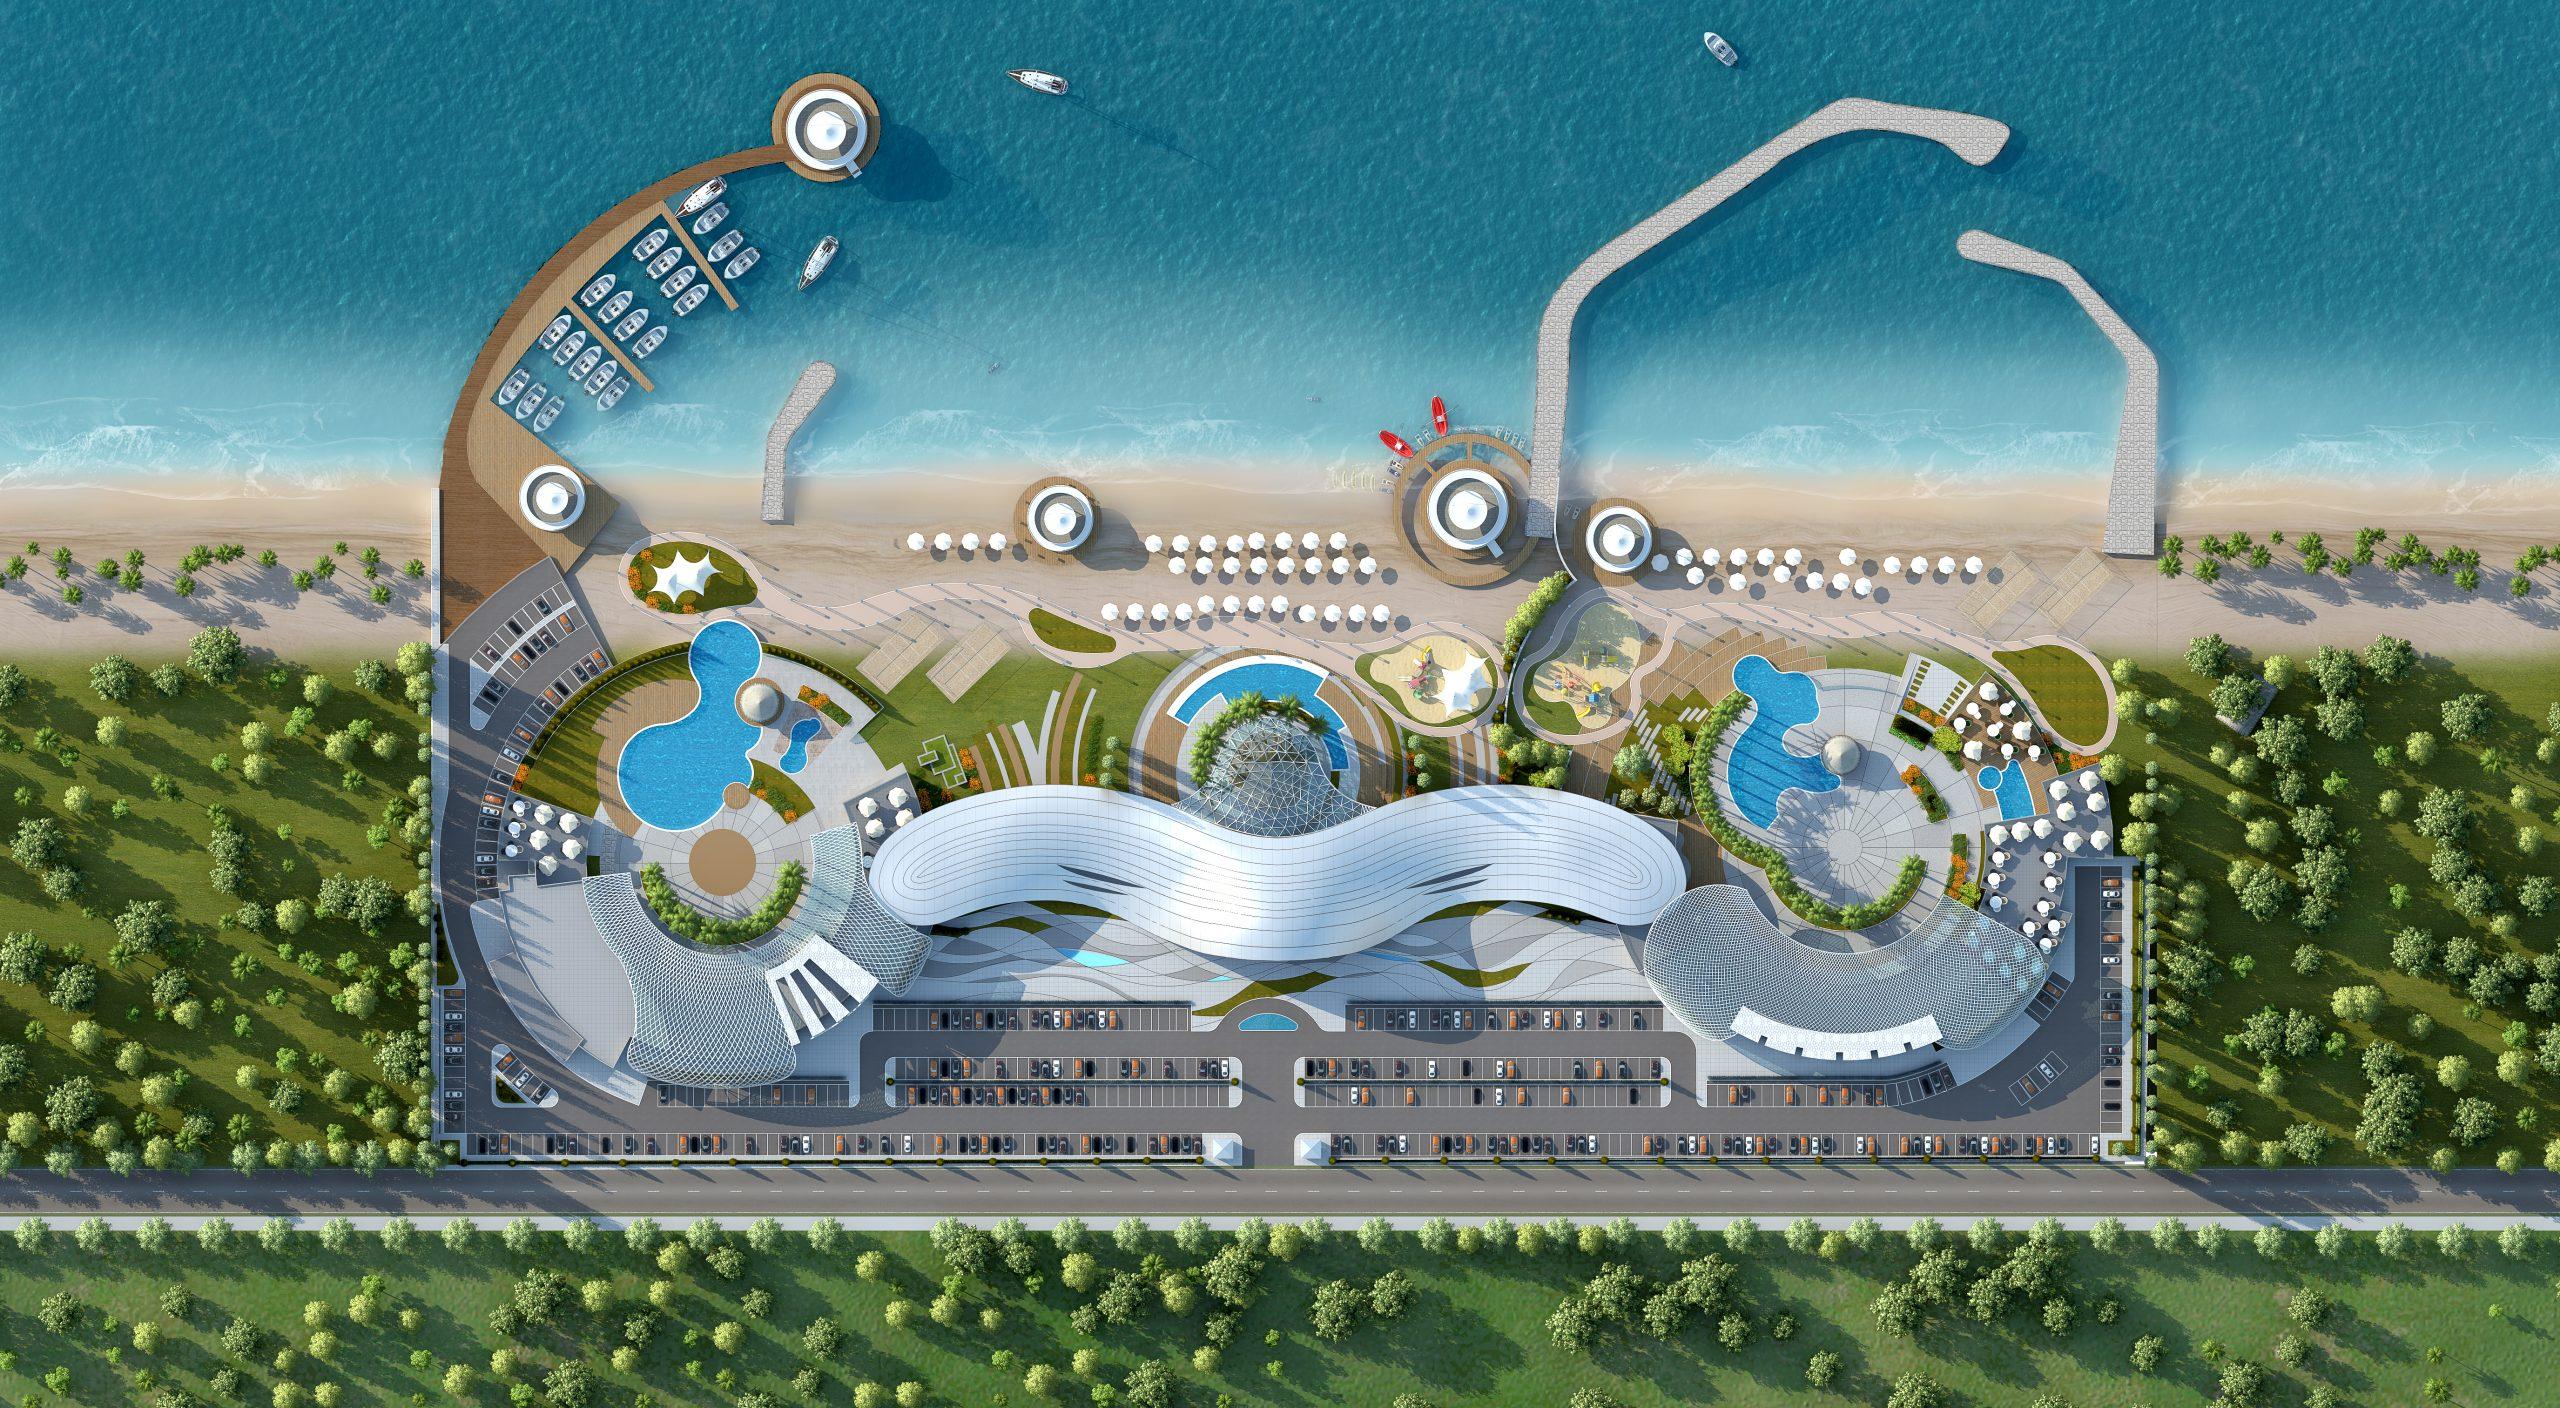 Namak_Abrud Beach Club Interior Design, Modelling & Virtual Reality - Arsan Sarmayeh is a leading Bim company in providing Bim building information modeling and VR virtual reality services - as well as BIM building information modeling projects and VR virtual reality projects -